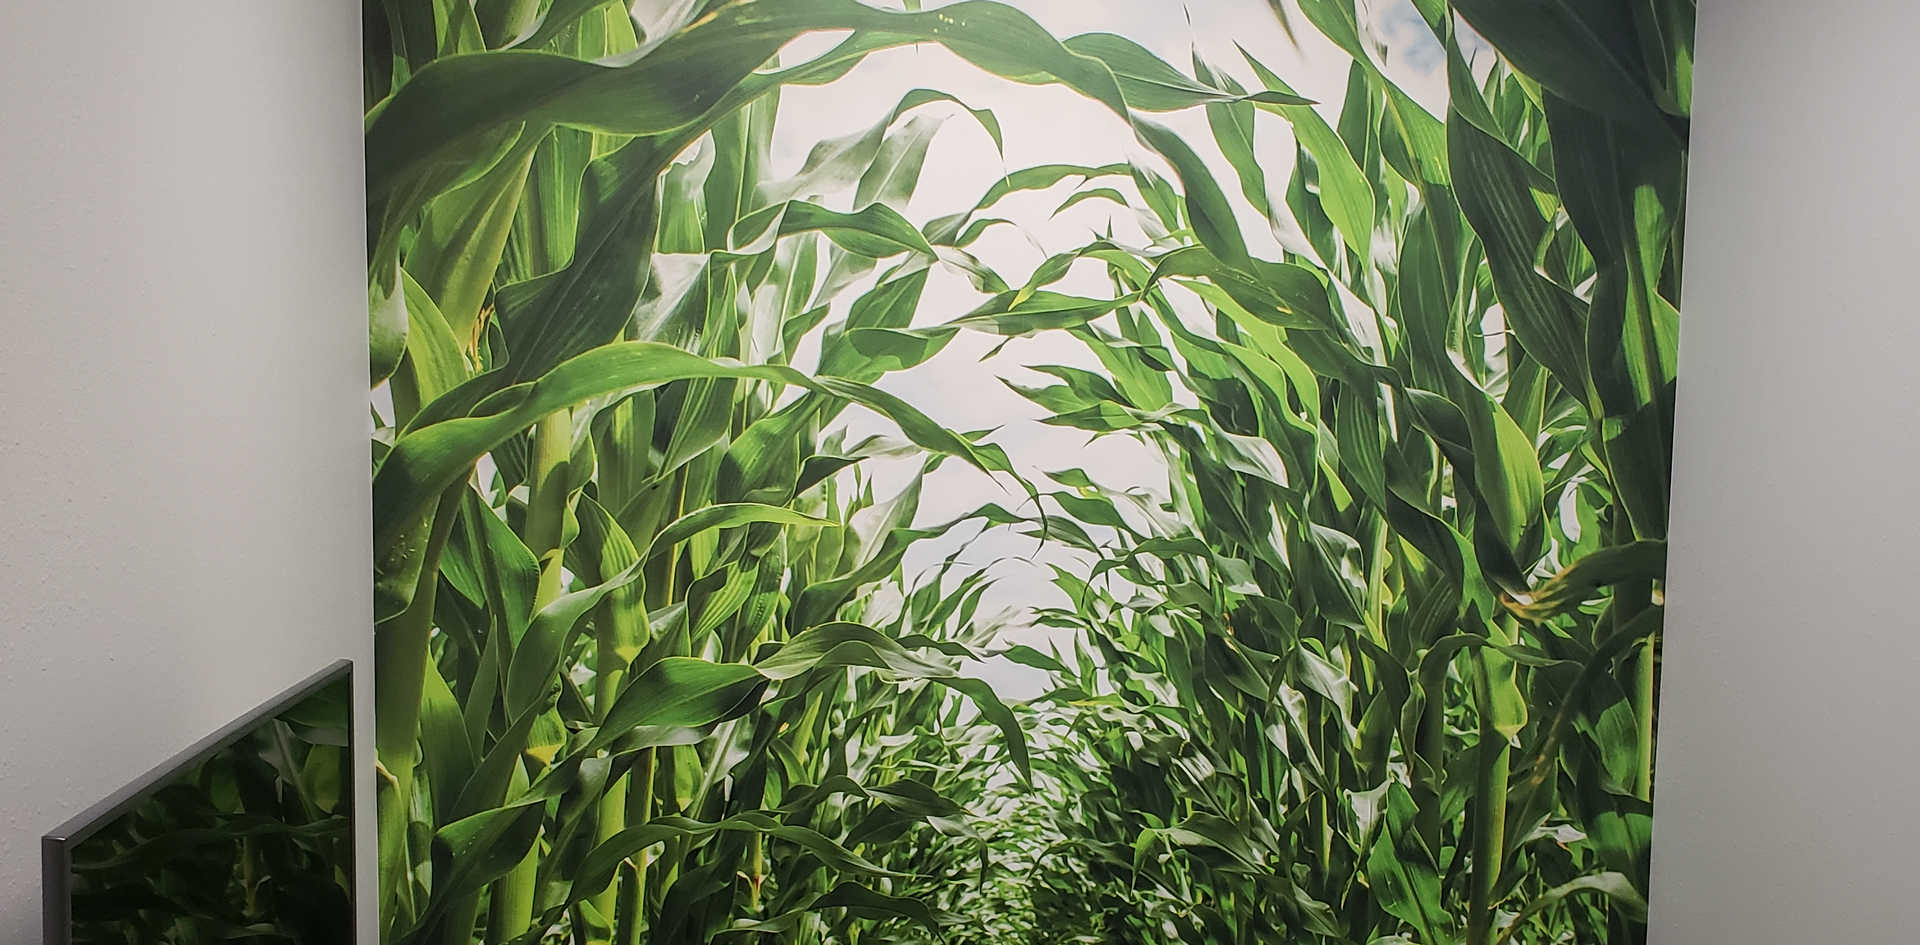 Christensen Farms: Meeting Room Wallcovering